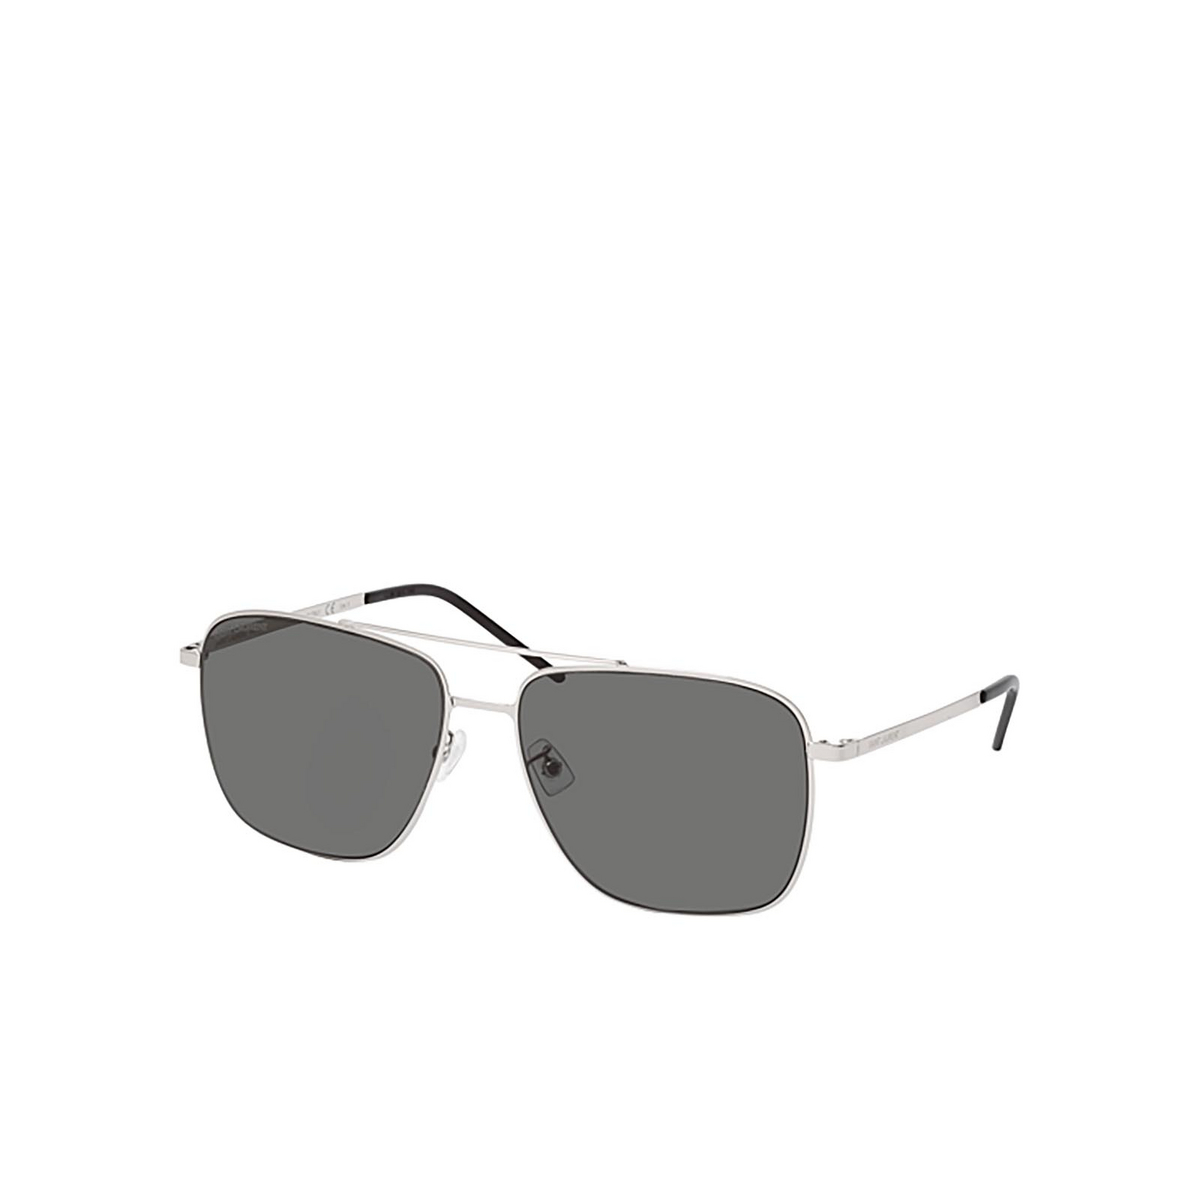 Saint Laurent® Aviator Sunglasses: SL 376 SLIM color Silver 001 - 2/2.